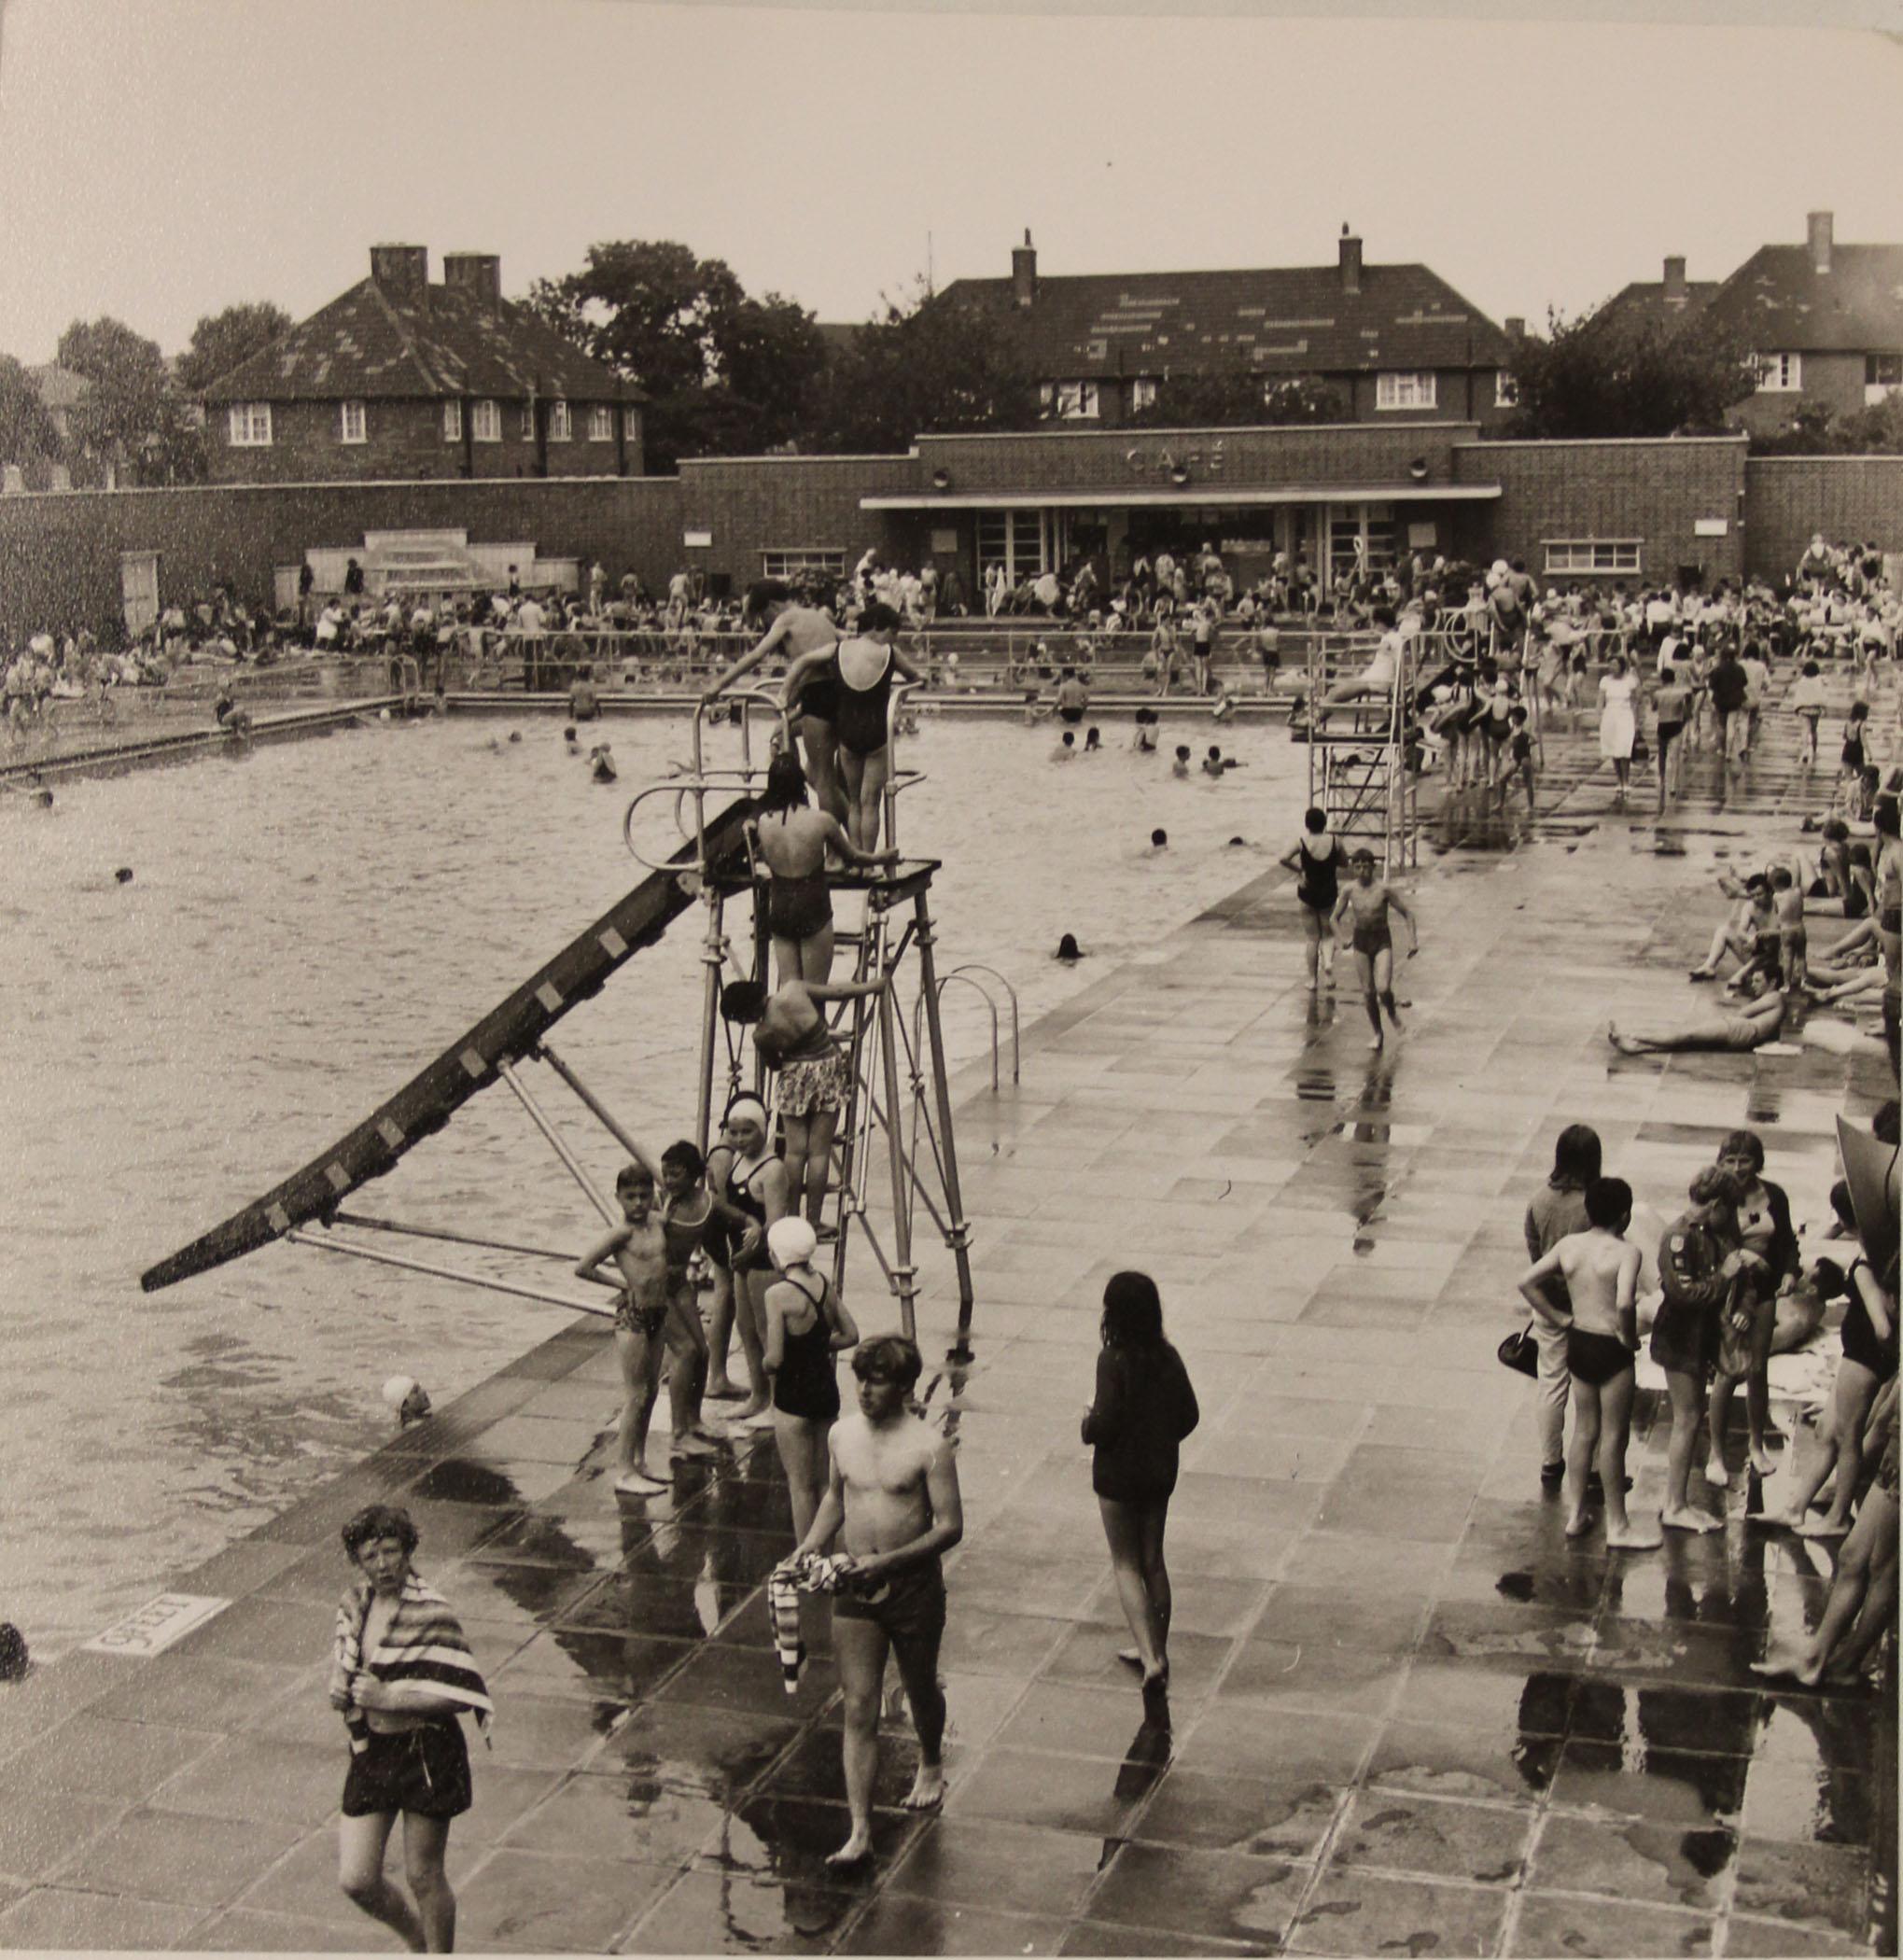 Hornfair park charlton parks reminiscence project for Kingsbury swimming pool timetable